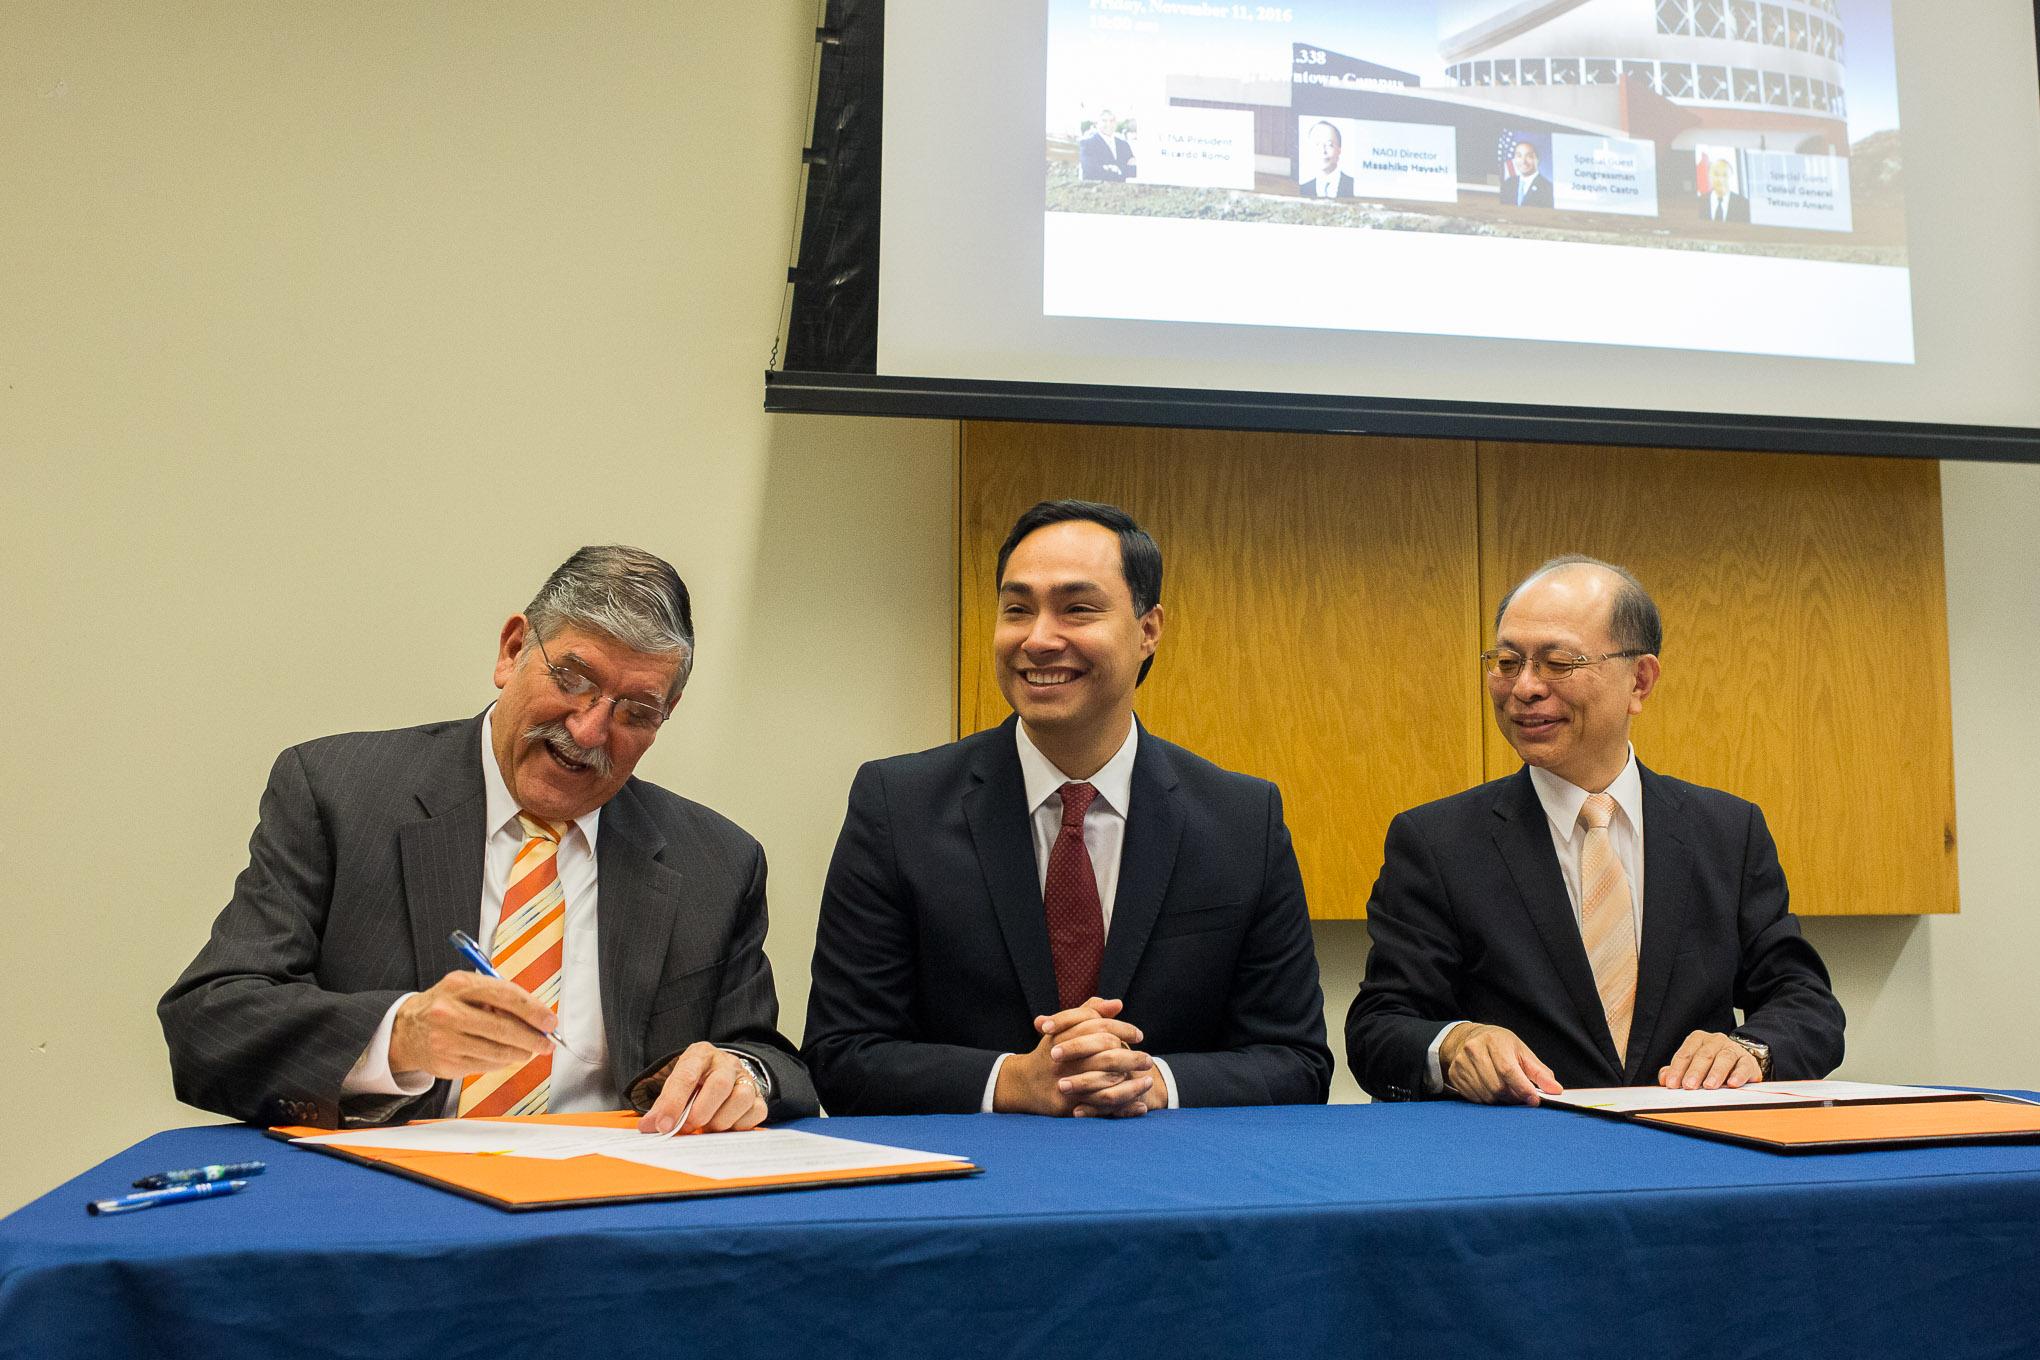 From left: UTSA President Ricardo Romo, Congressman Joaquin Castro, and NAOJ Director Masahiko Hayashi sign an agreement to collaborate with Japan on astronomy.